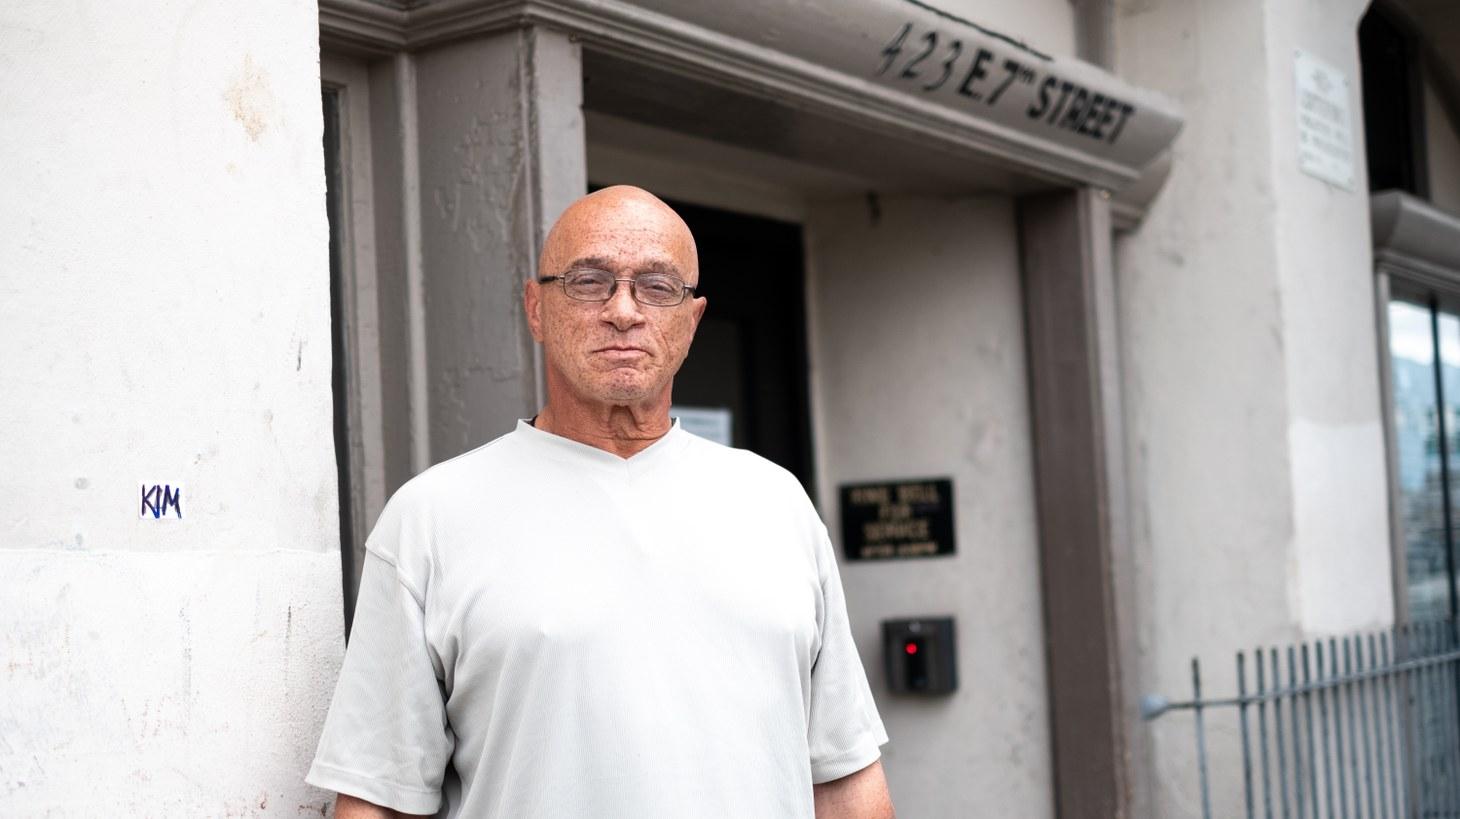 Paul Williams outside his unit.